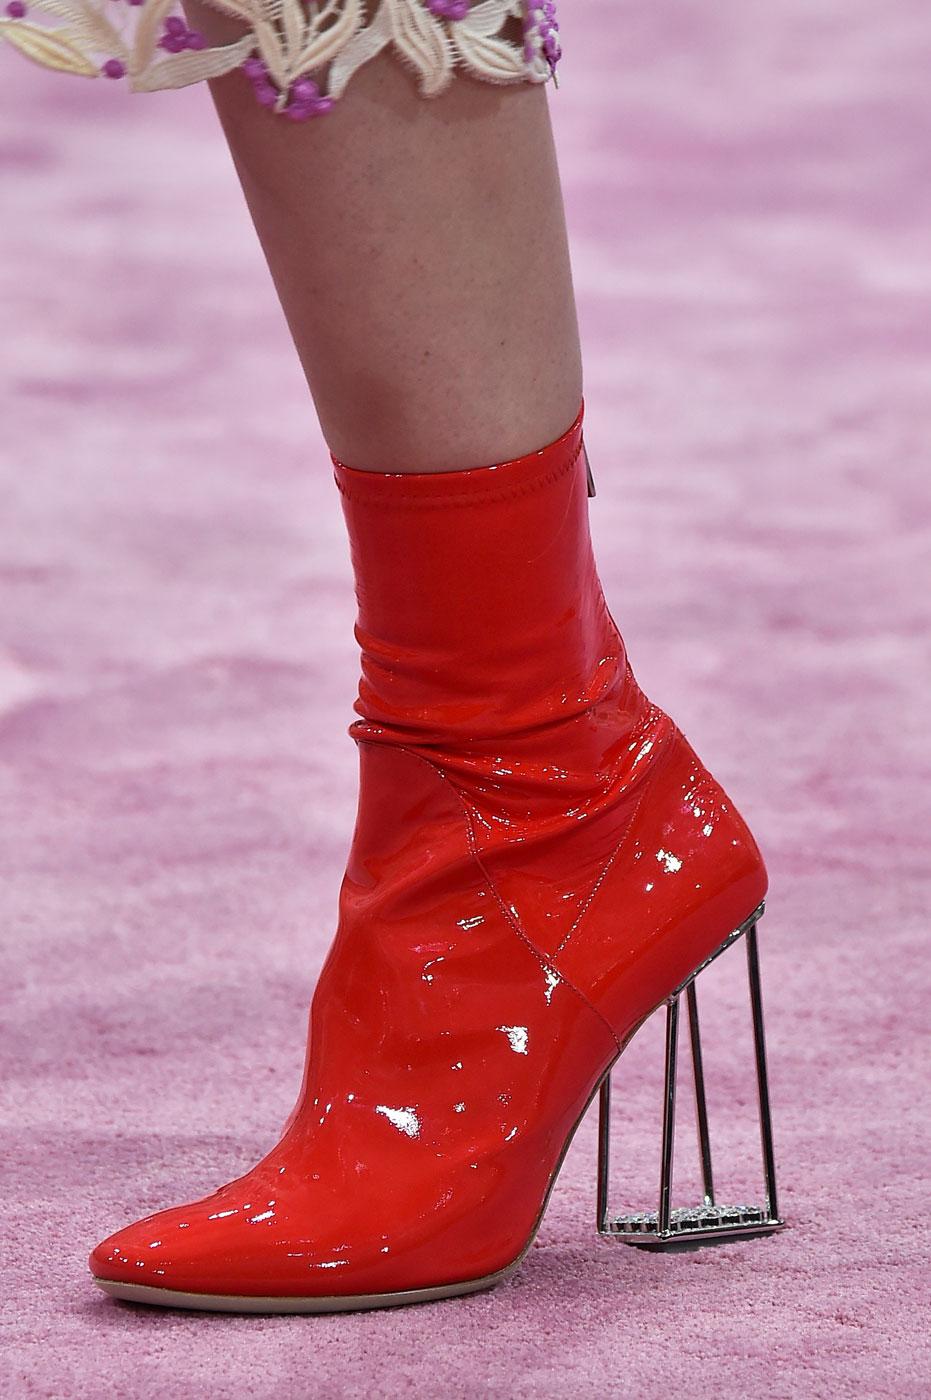 Christian-Dior-fashion-runway-show-close-ups-haute-couture-paris-spring-summer-2015-the-impression-177